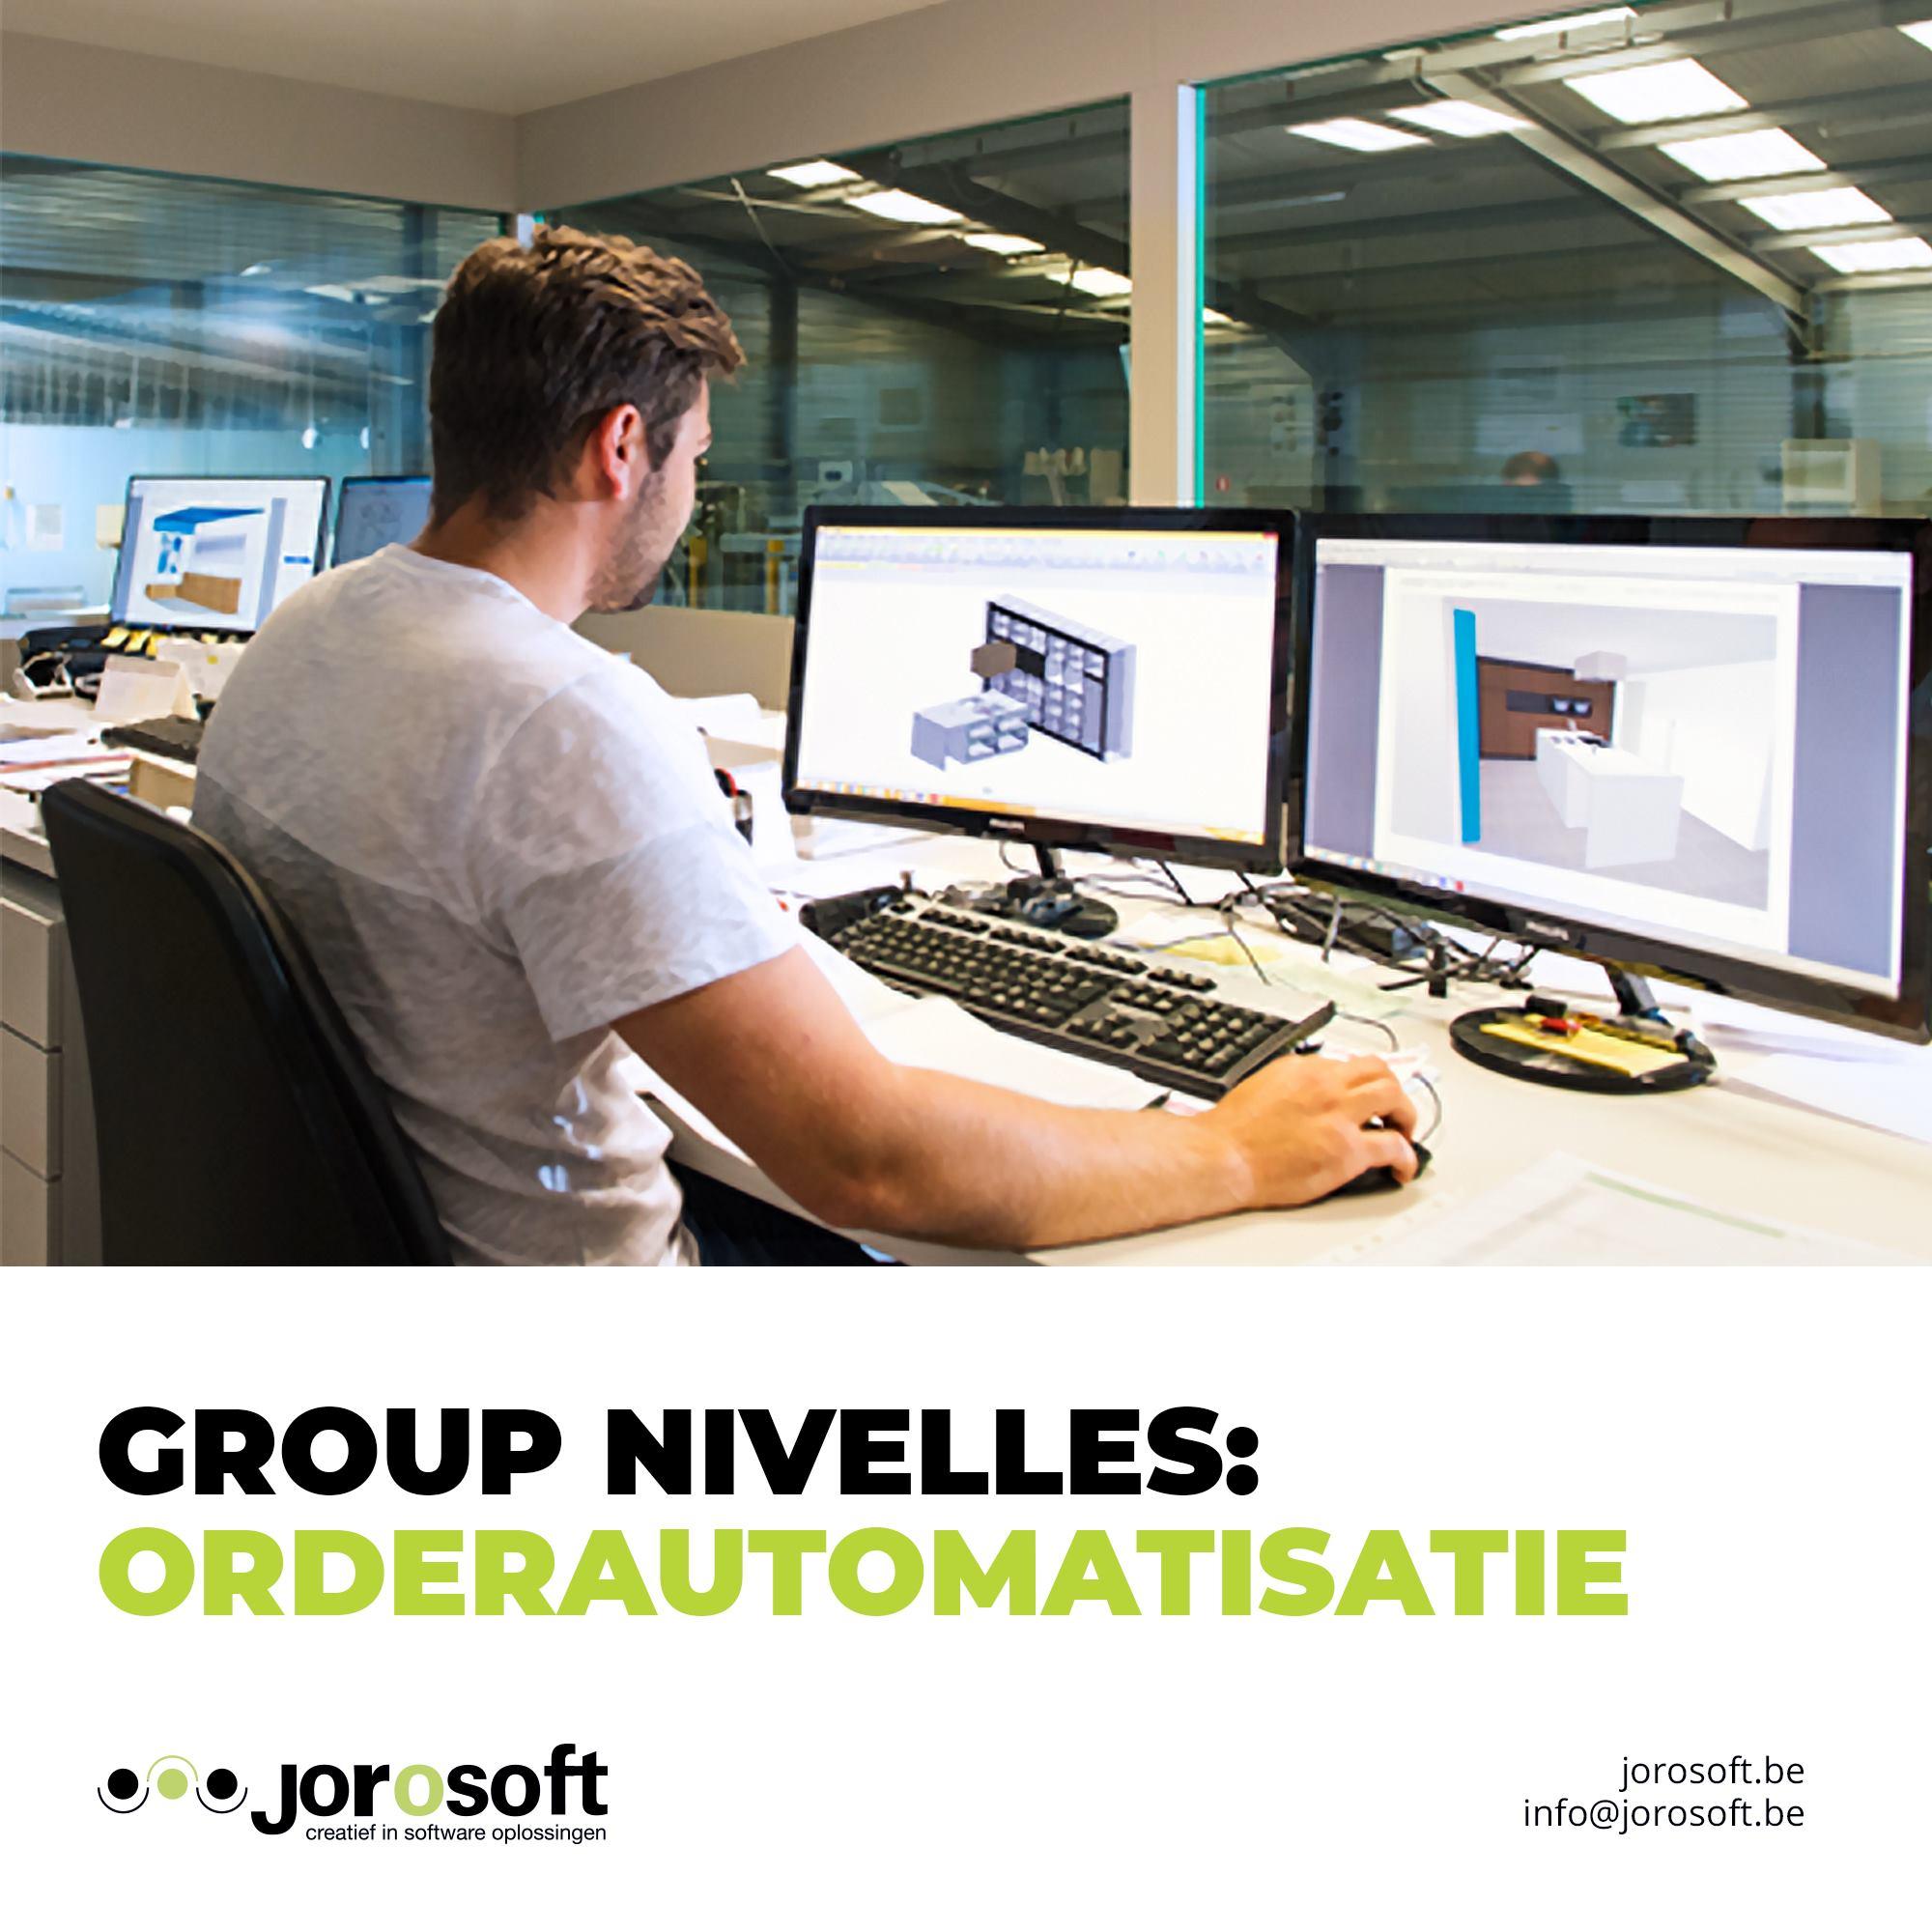 Group Nivelles gaat in één beweging van order naar badkamer